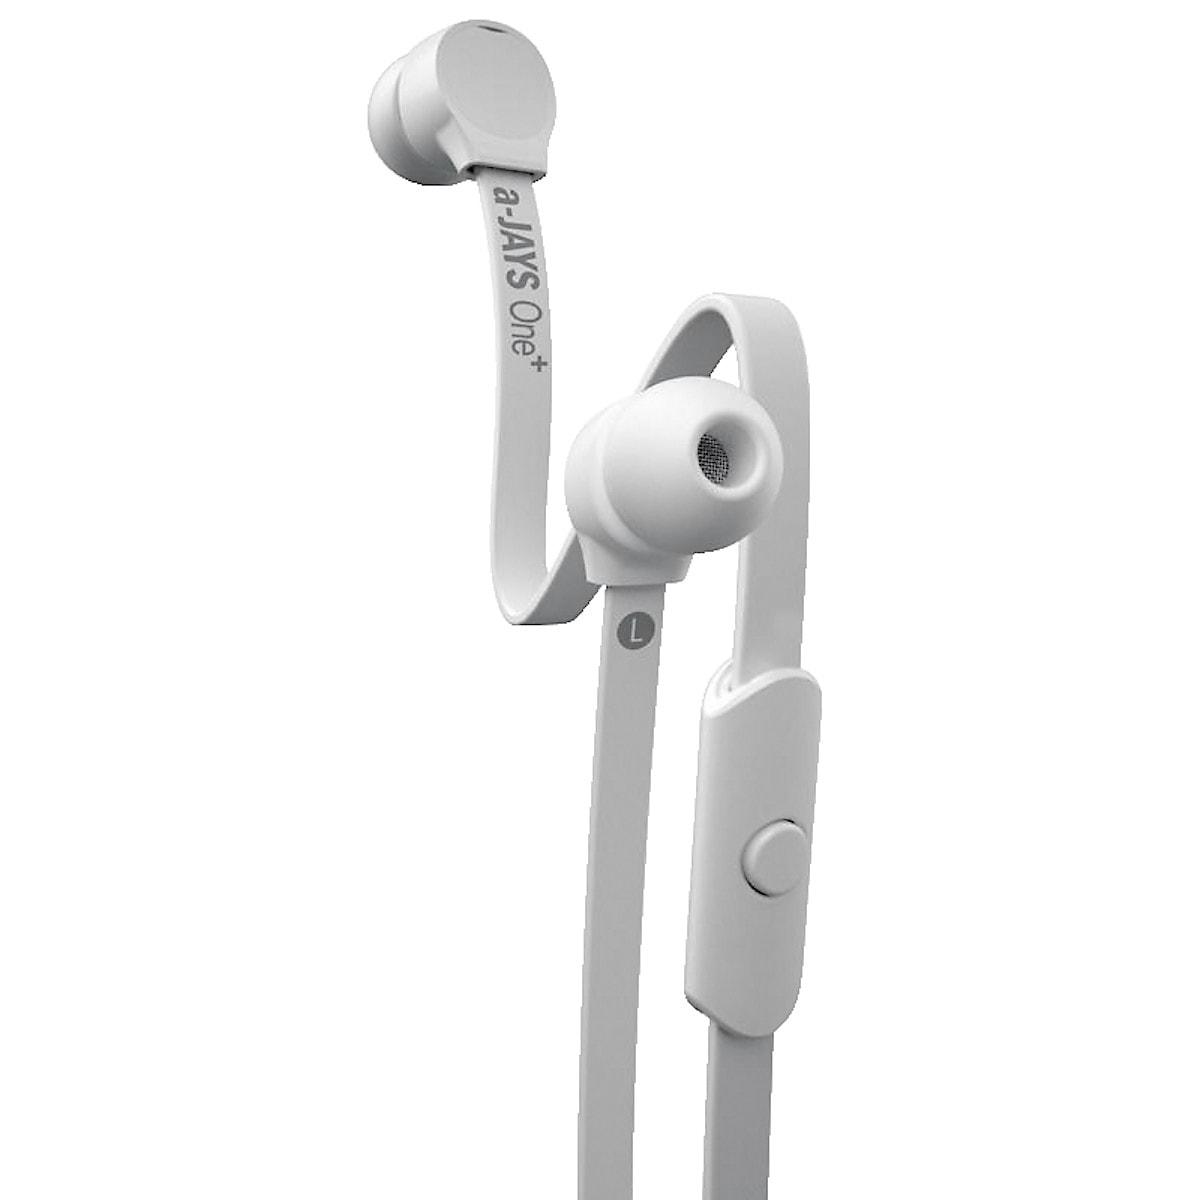 Kopfhörer mit Mikrofon A-Jays One+